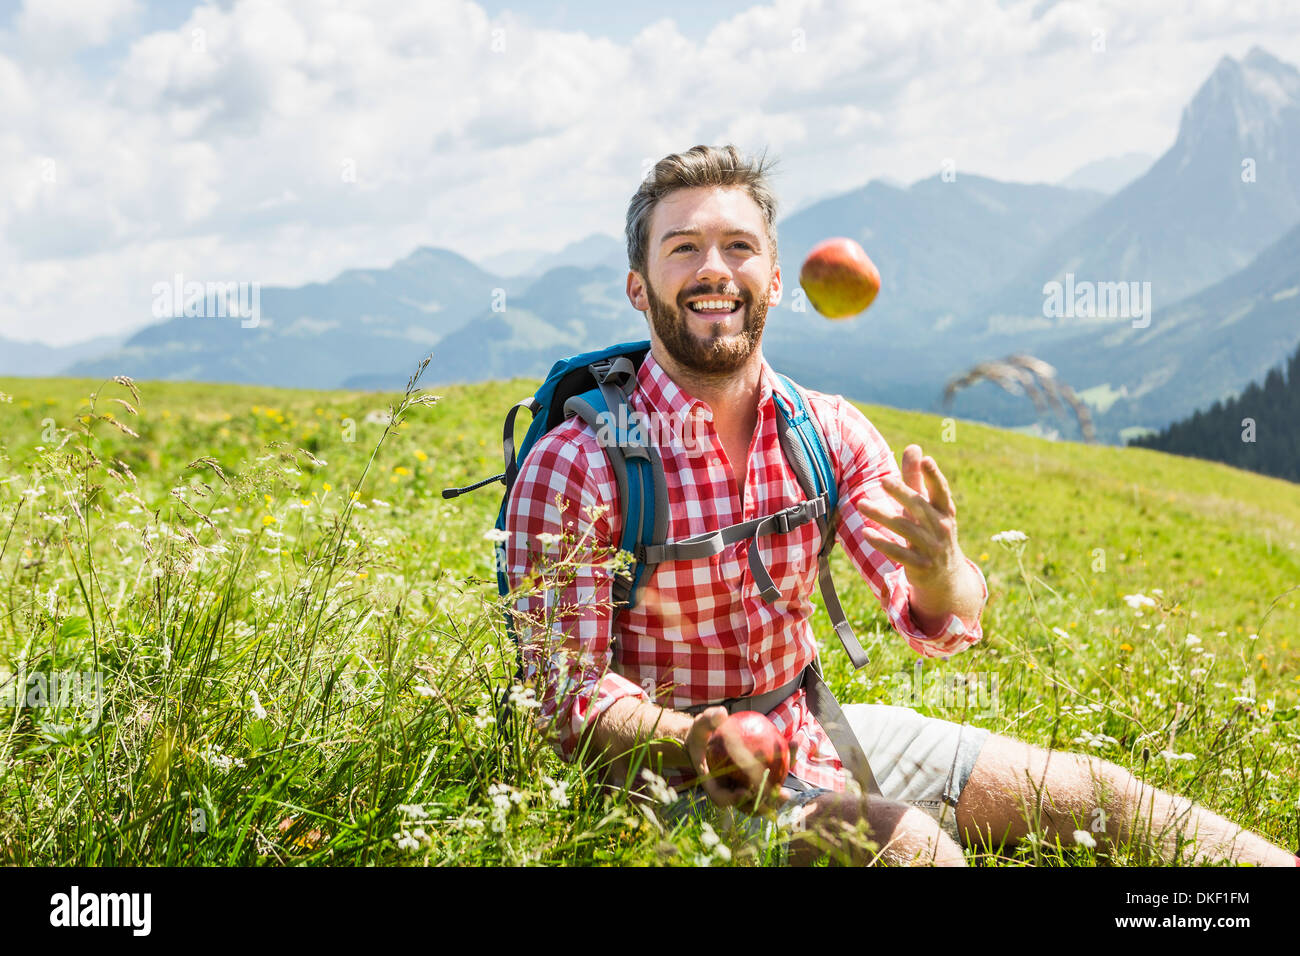 Man throwing apple, Tyrol, Austria - Stock Image